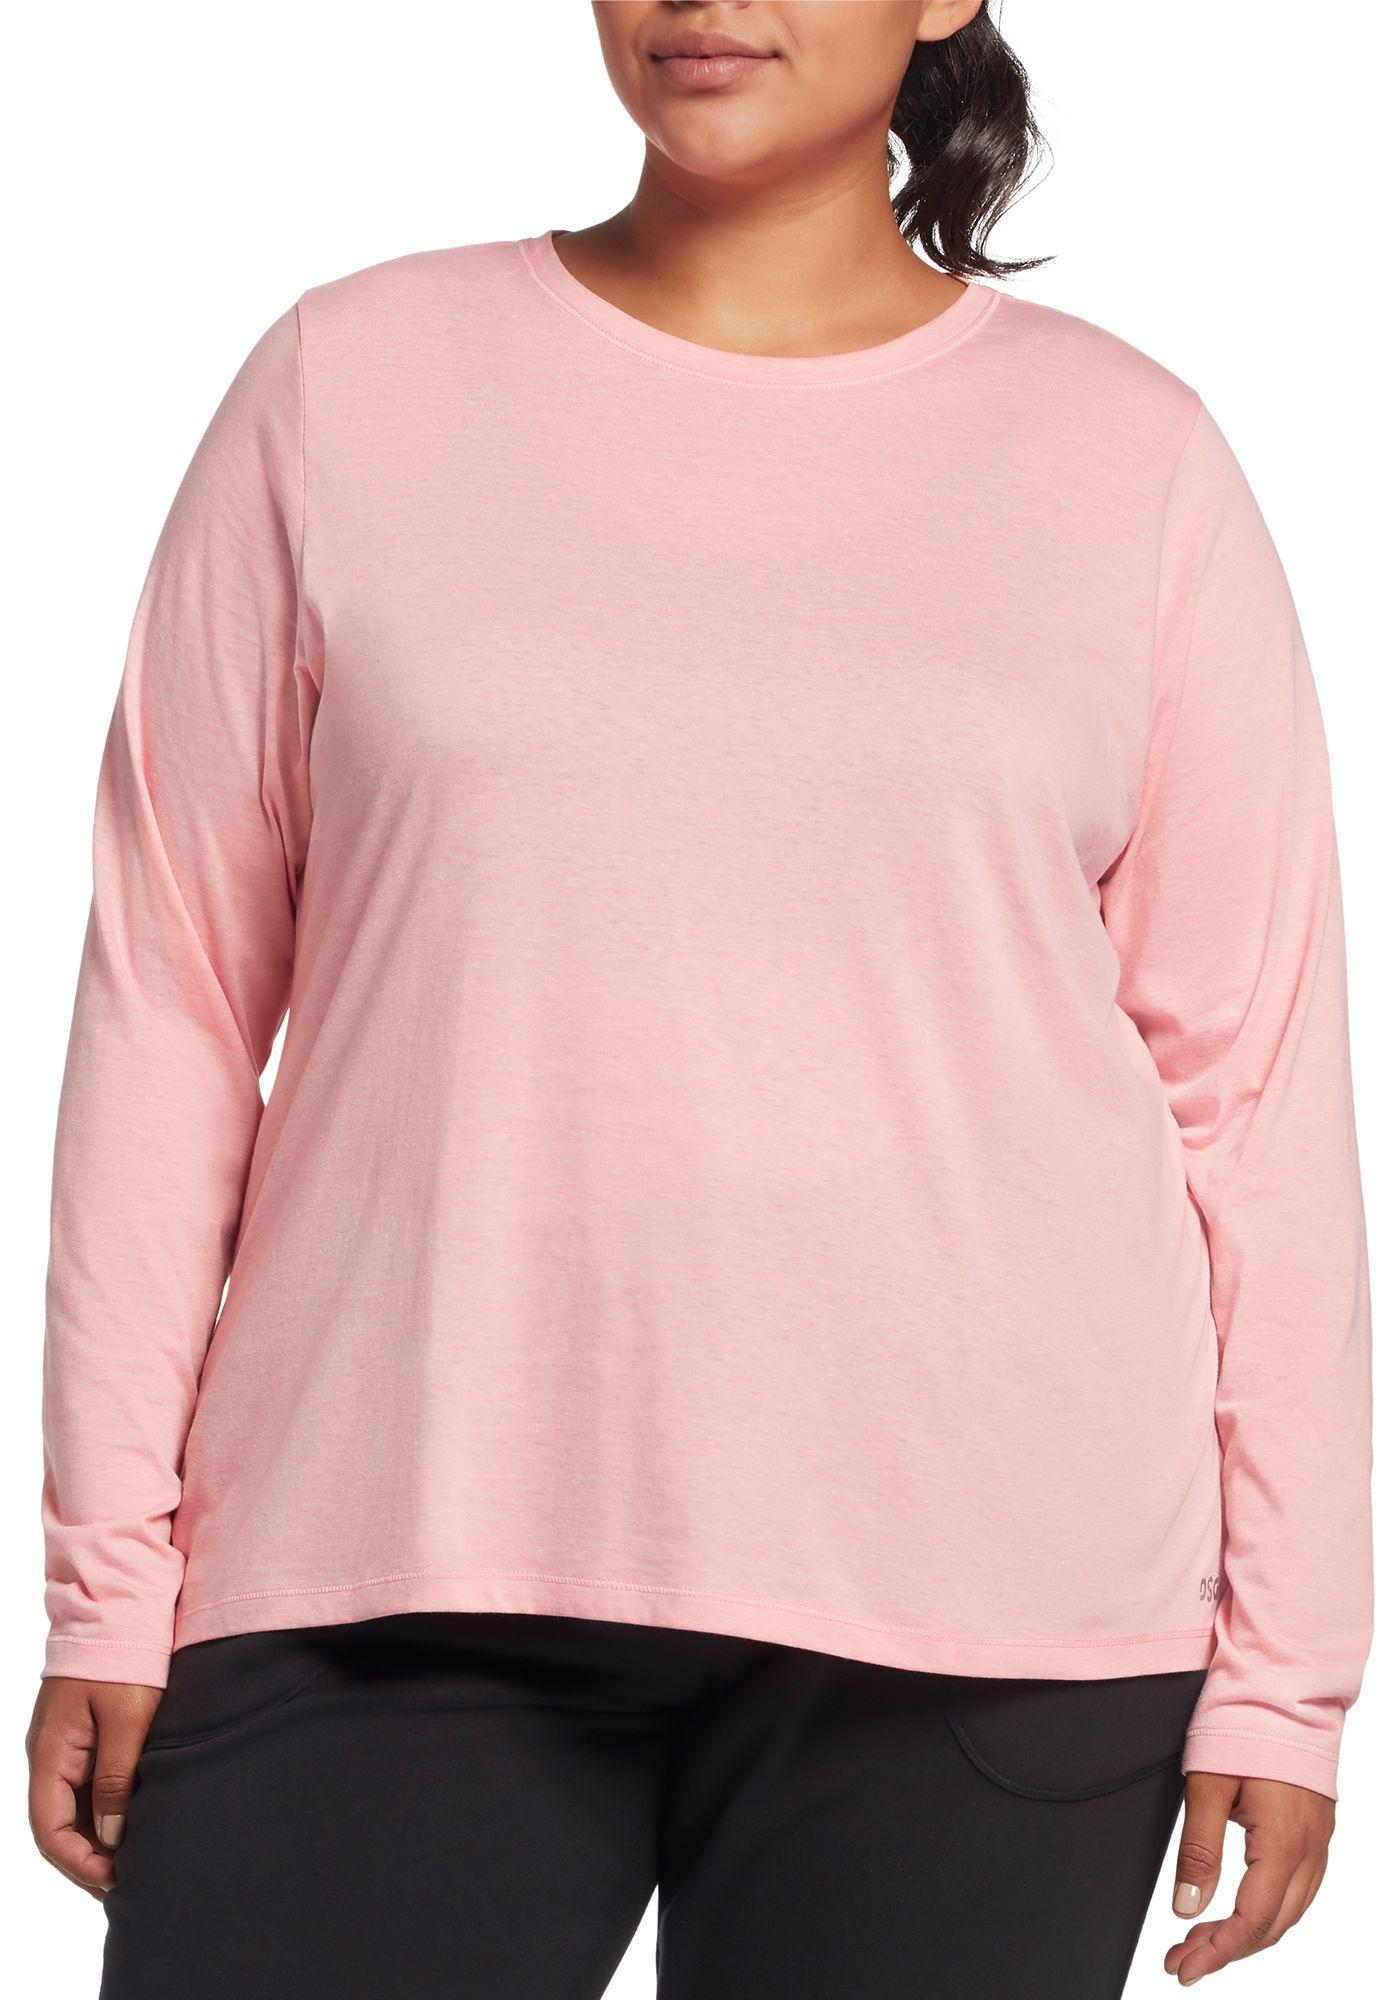 DSG Women's Plus Size Core Cotton Jersey Long Sleeve Shirt